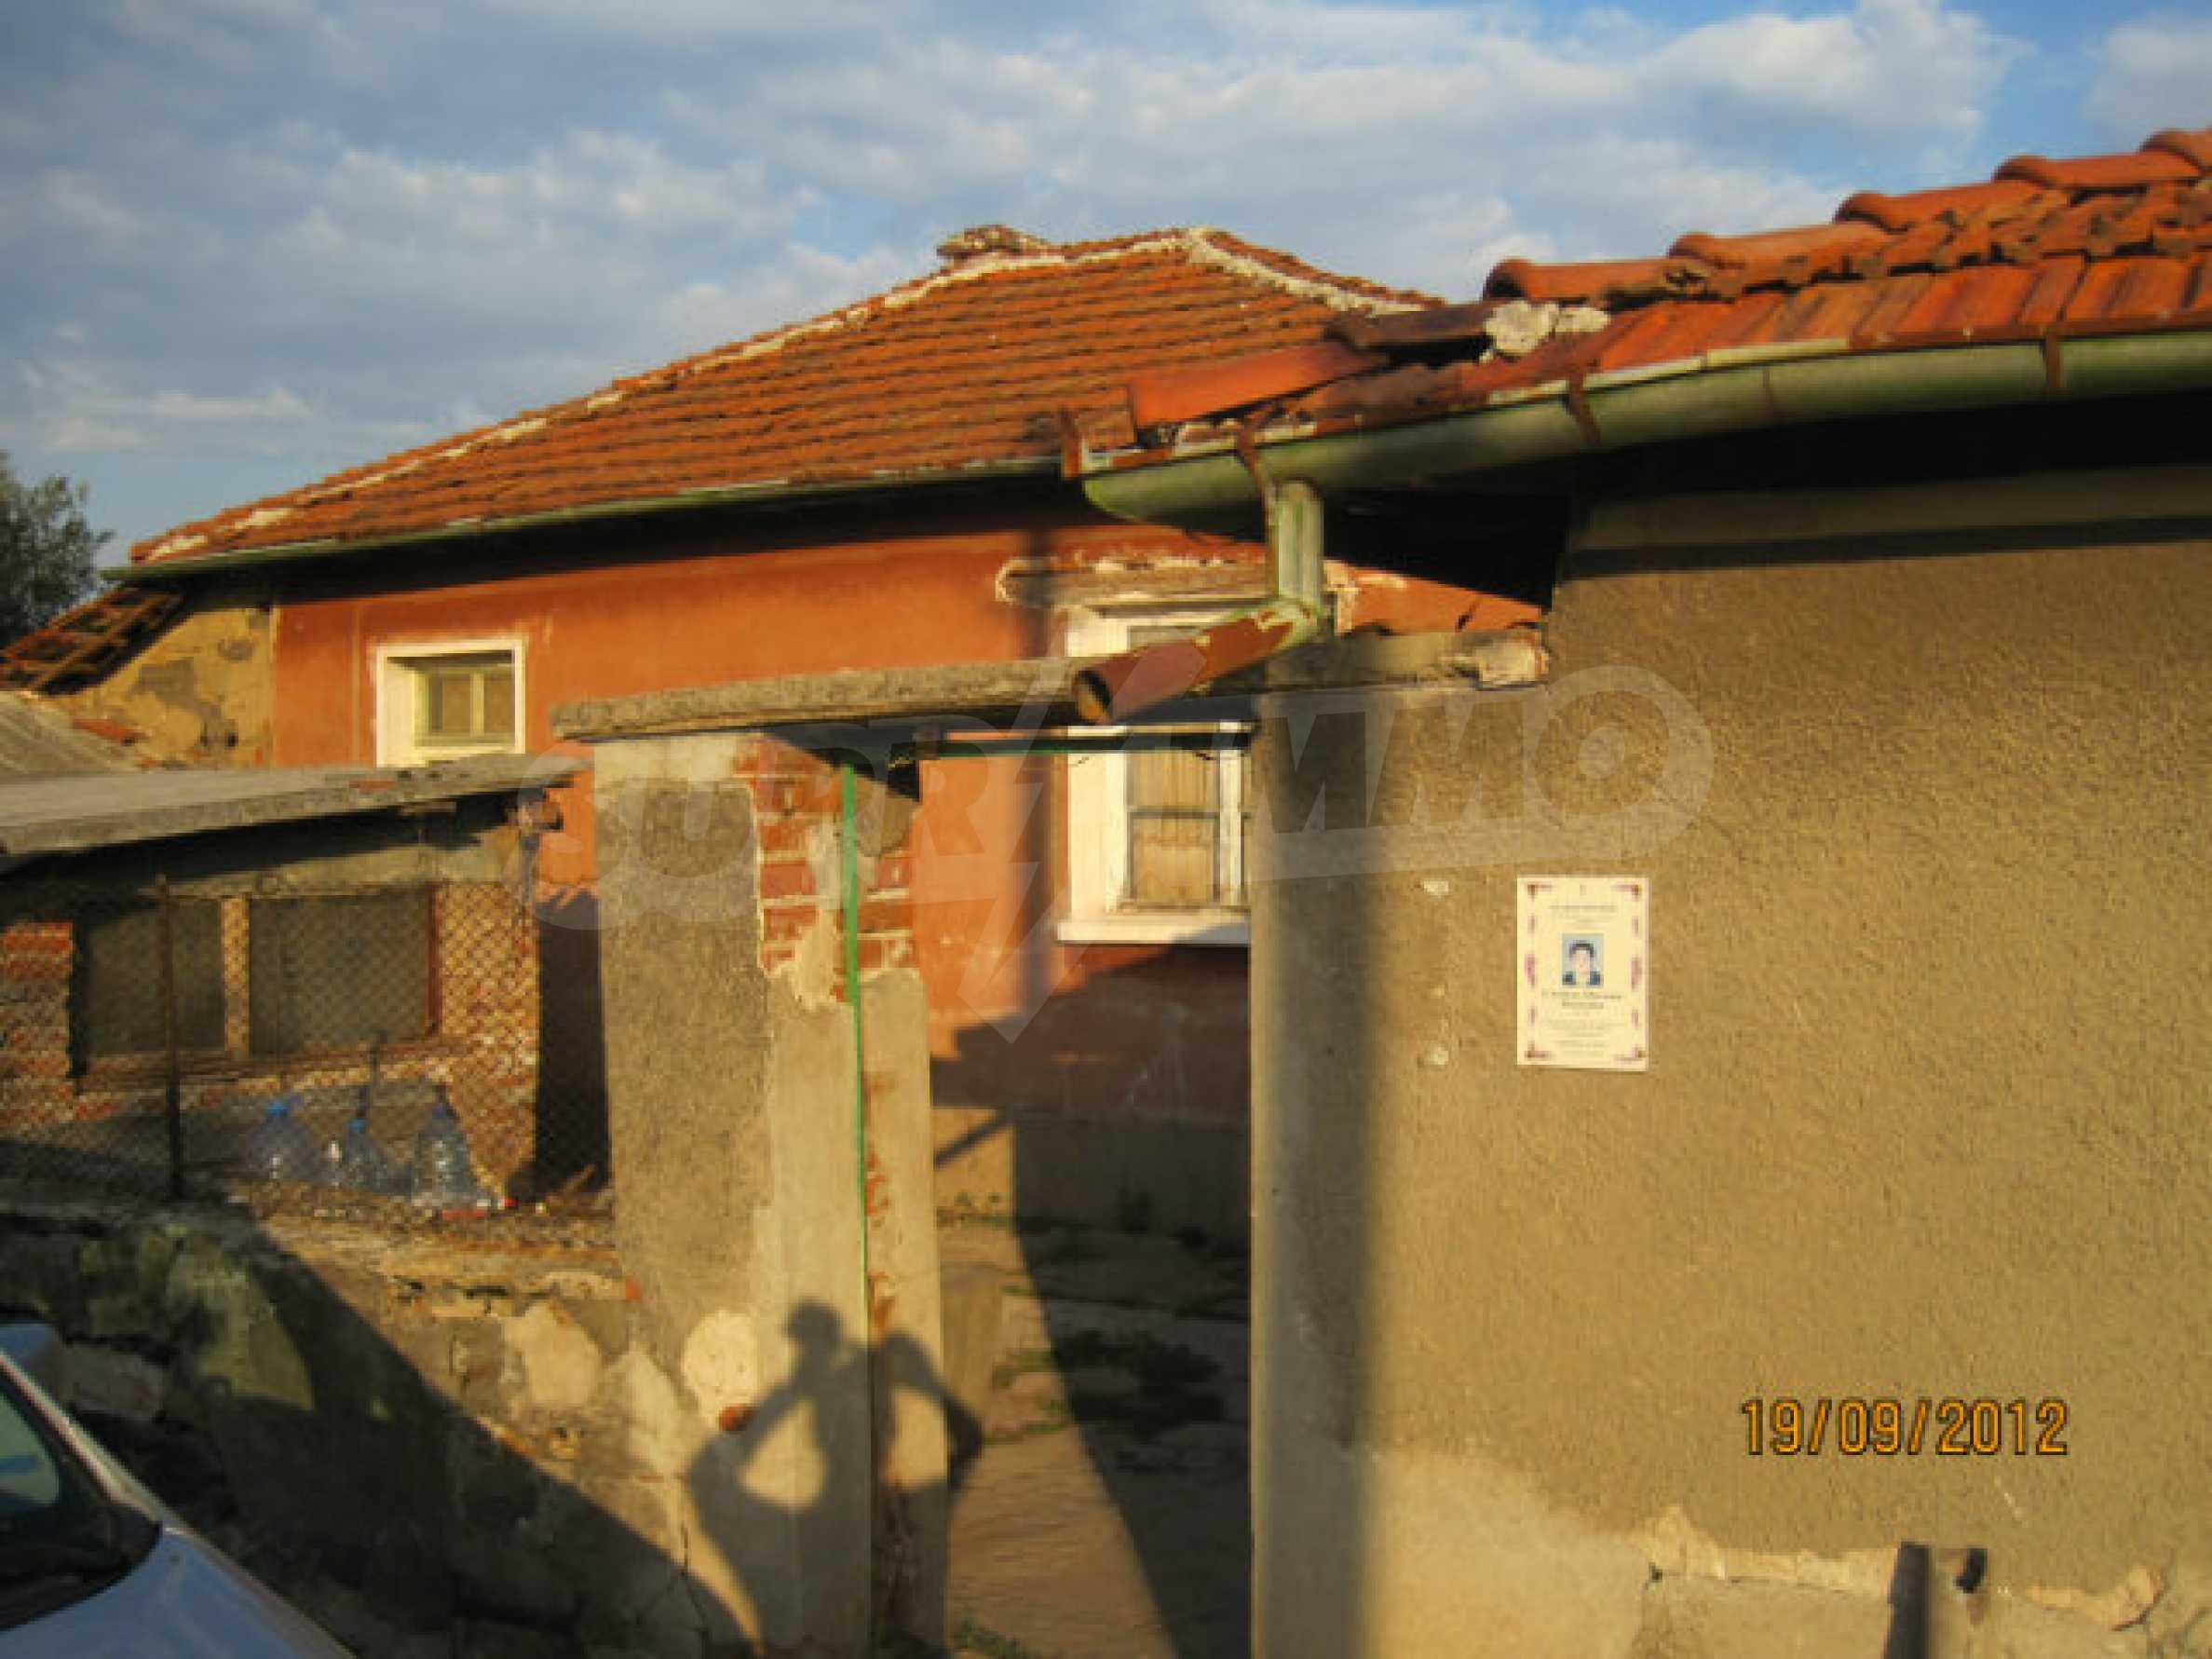 Detached house for sale in a quiet village near Dimitrovgrad